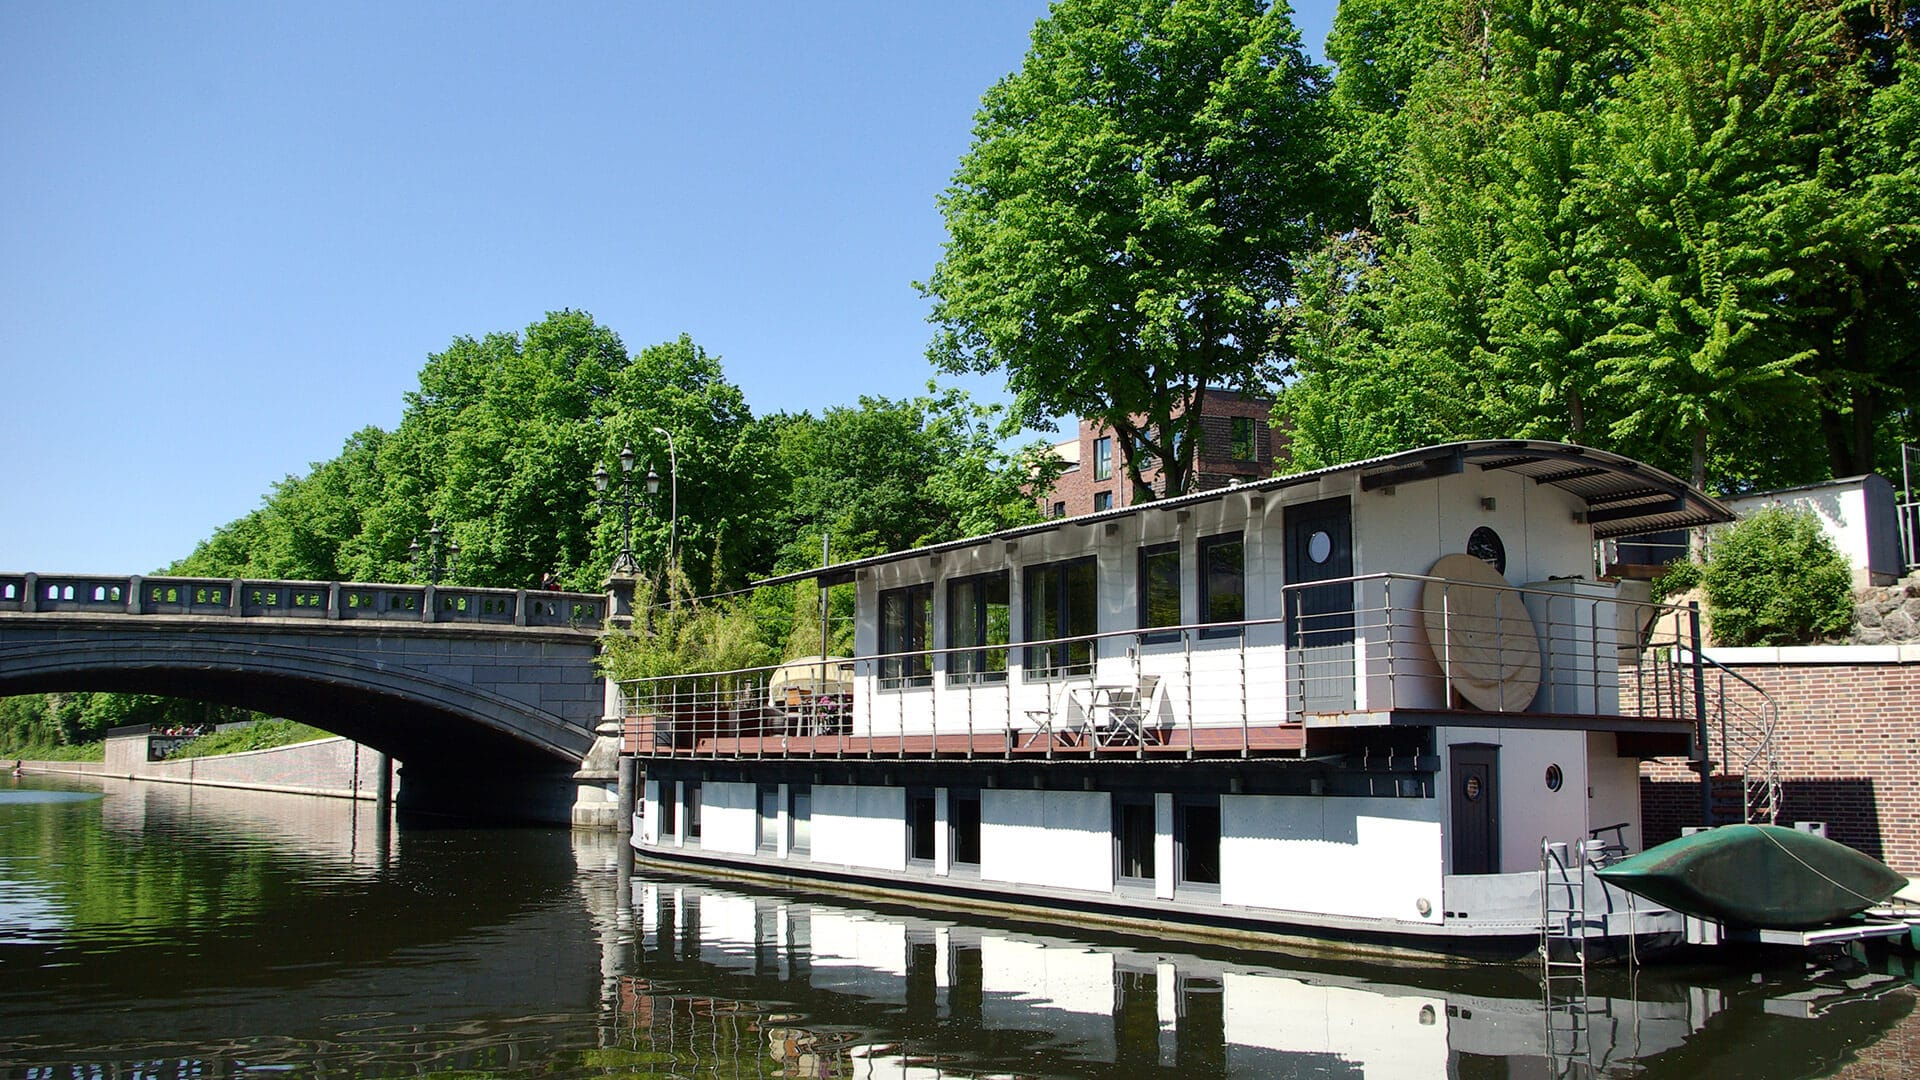 Peissnitz Hausboot Hamburg